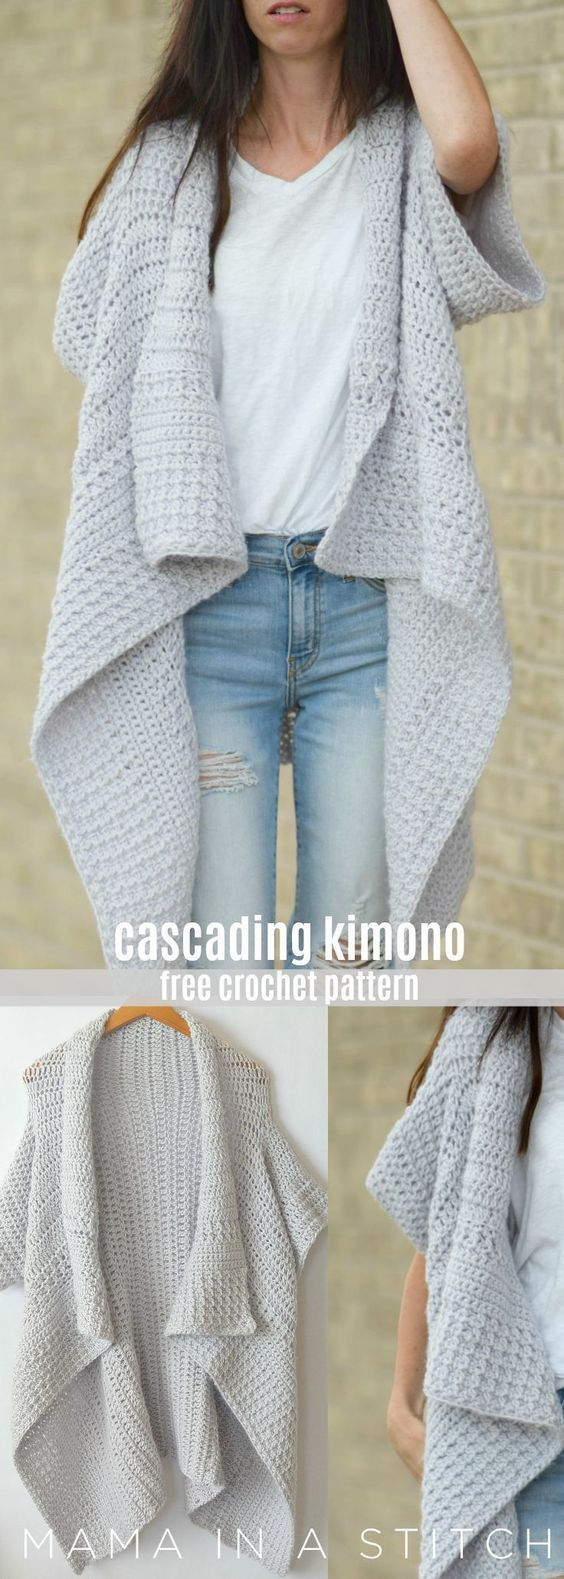 Cascading Kimono Cardigan Crochet Pattern #sweatercrochetpattern